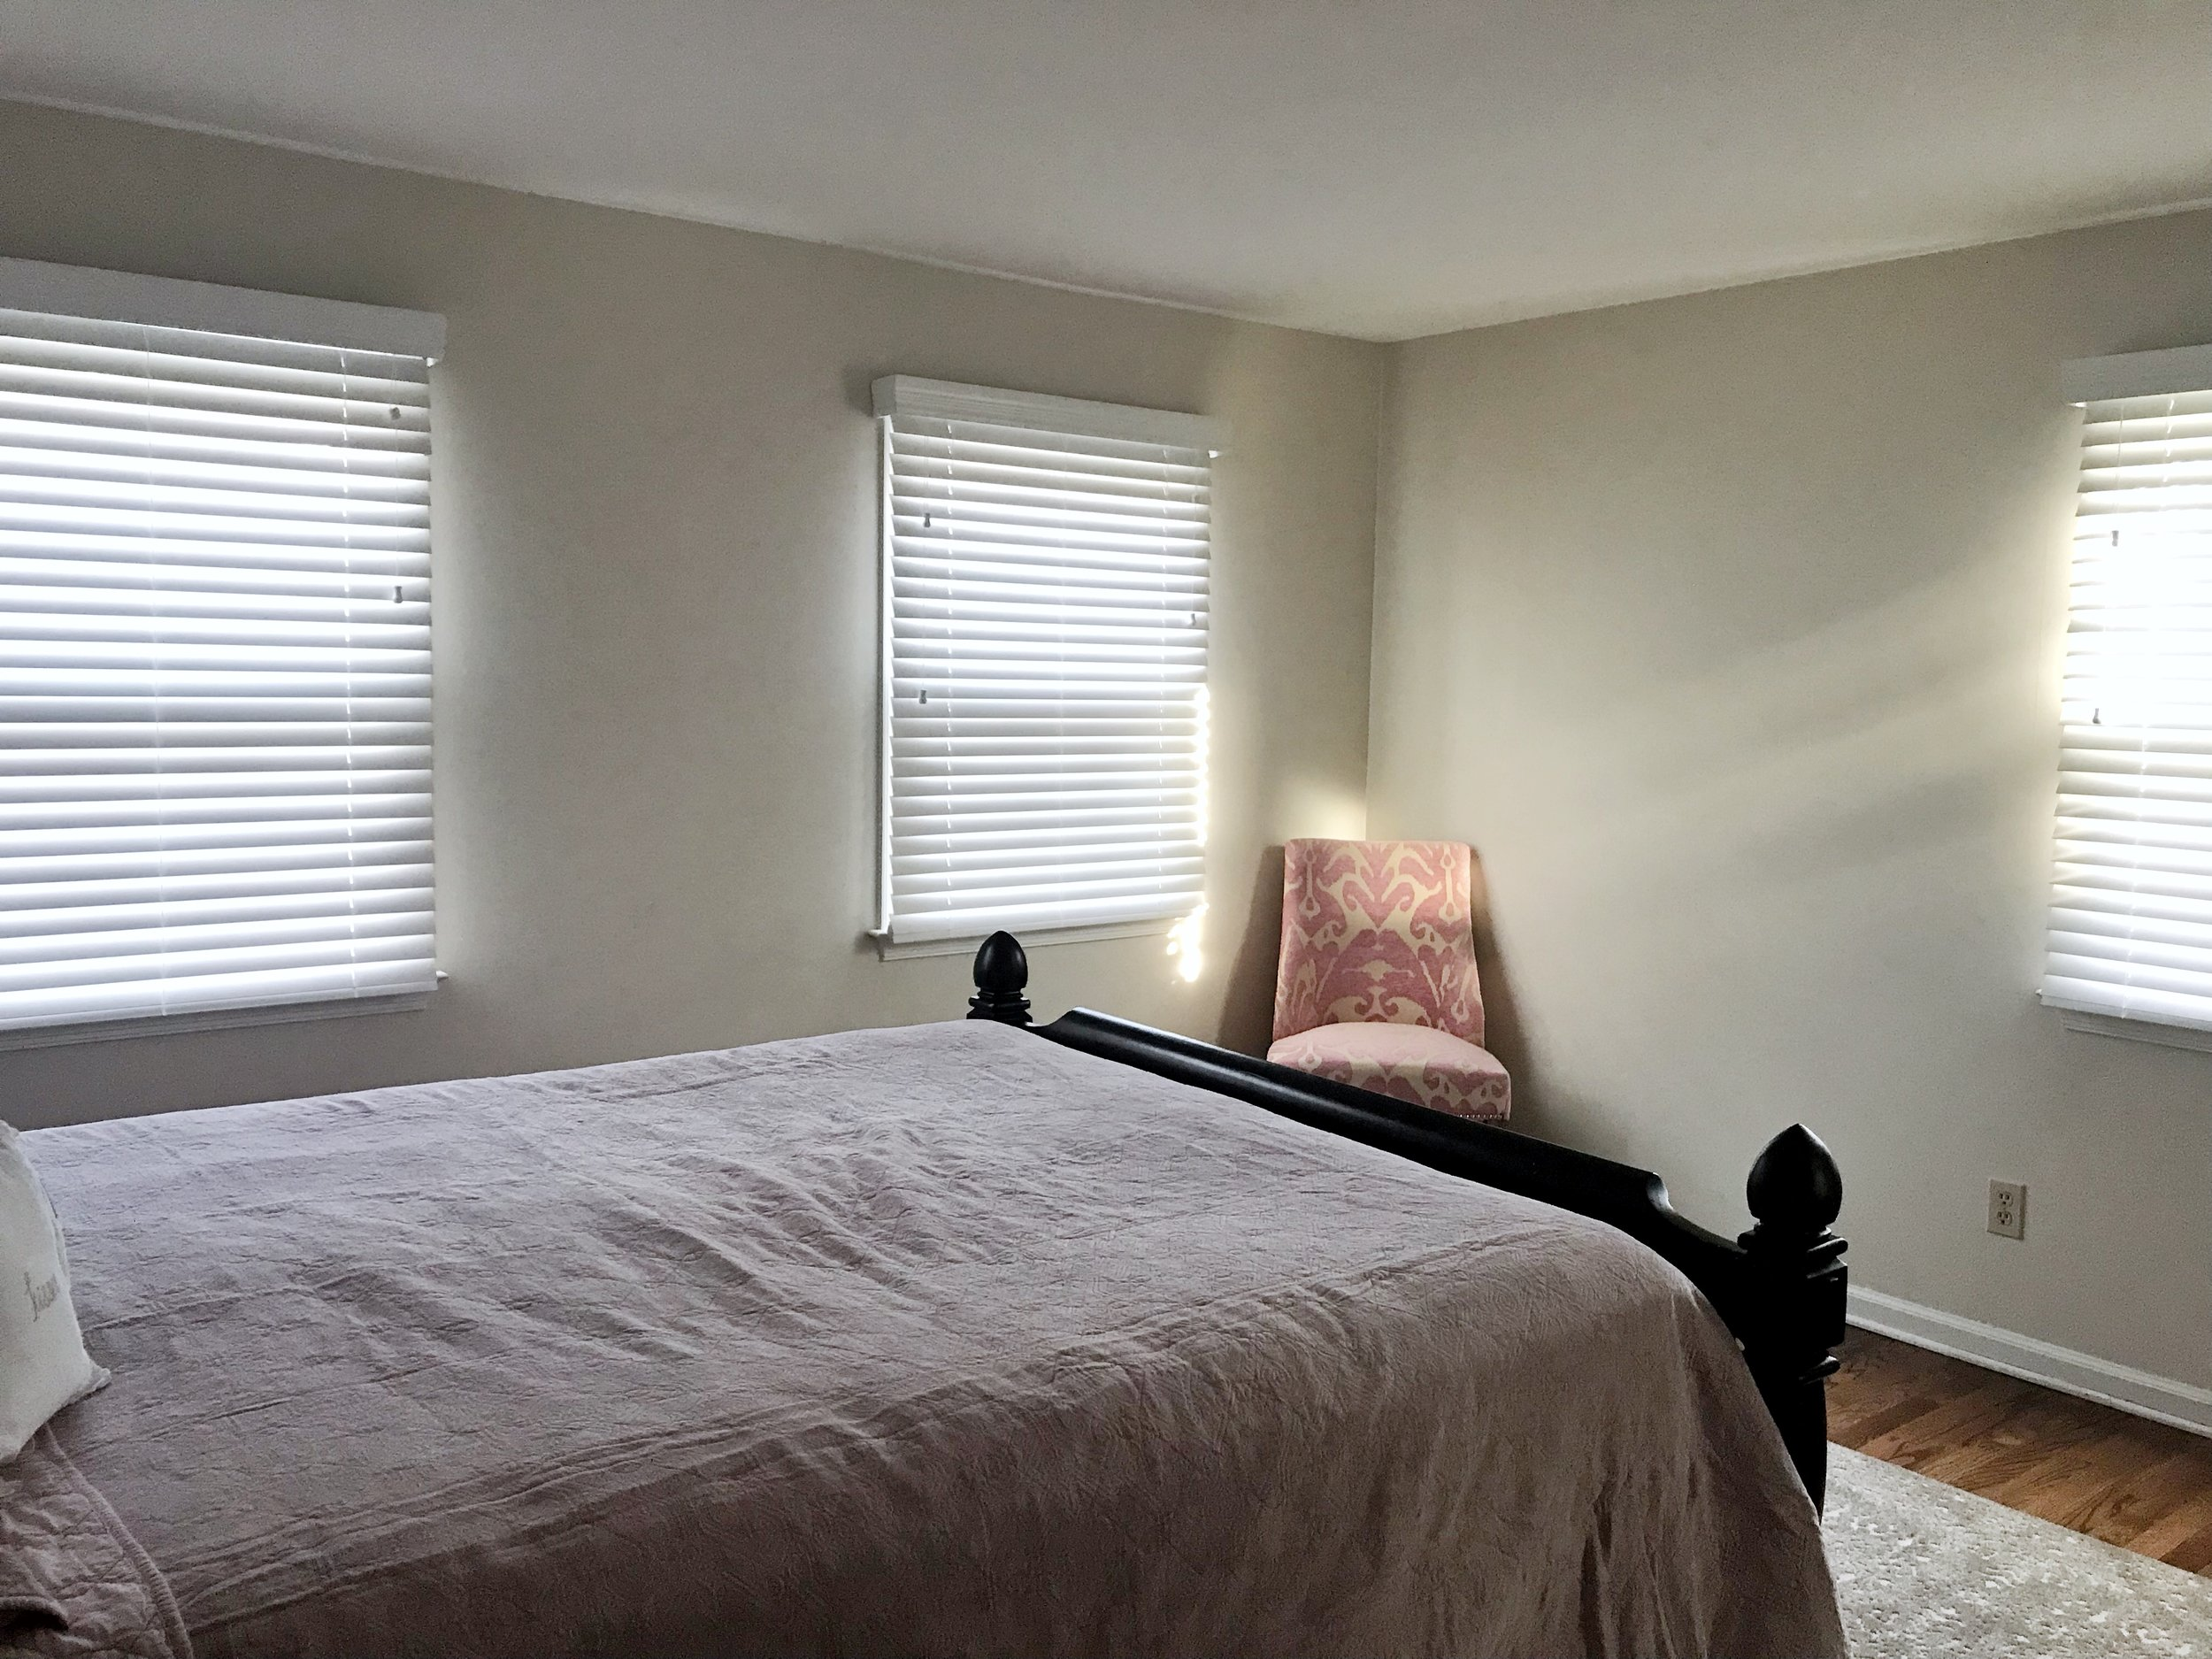 3rdGenBlinds white custom window blinds in guest bedroom